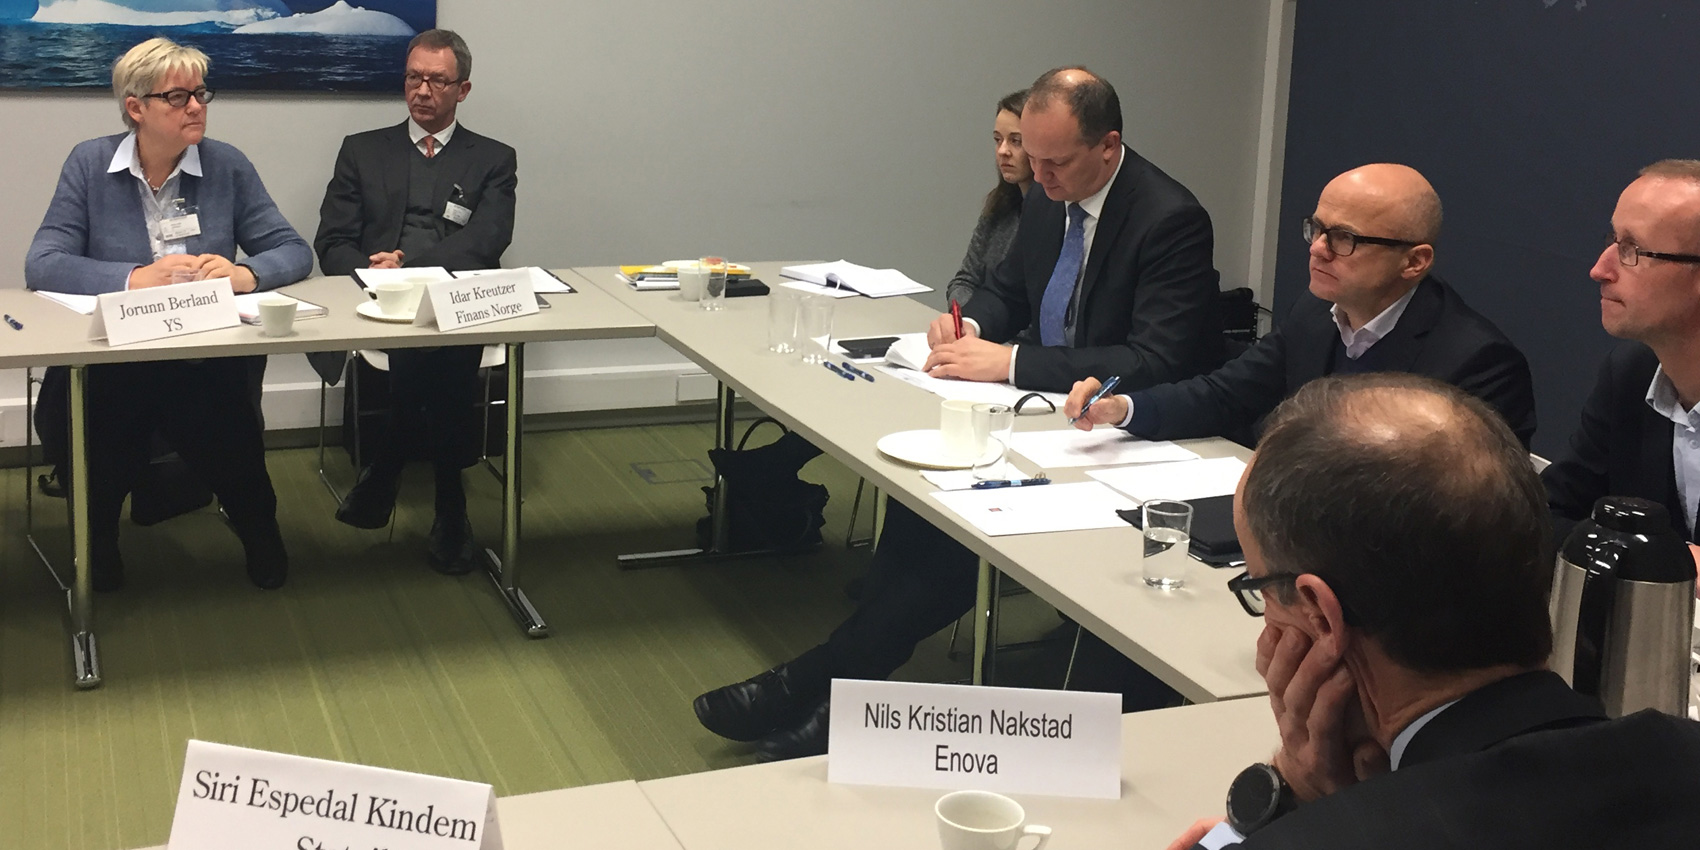 YS-leder Jorunn Berland, Idar Kreutzer, Finans Norge, samfedselsminister Ketil Solvik-Olsen og klima- og miljøminister Vidar Helgesen i KLimarådet sitter langs et bord og diskuterer.